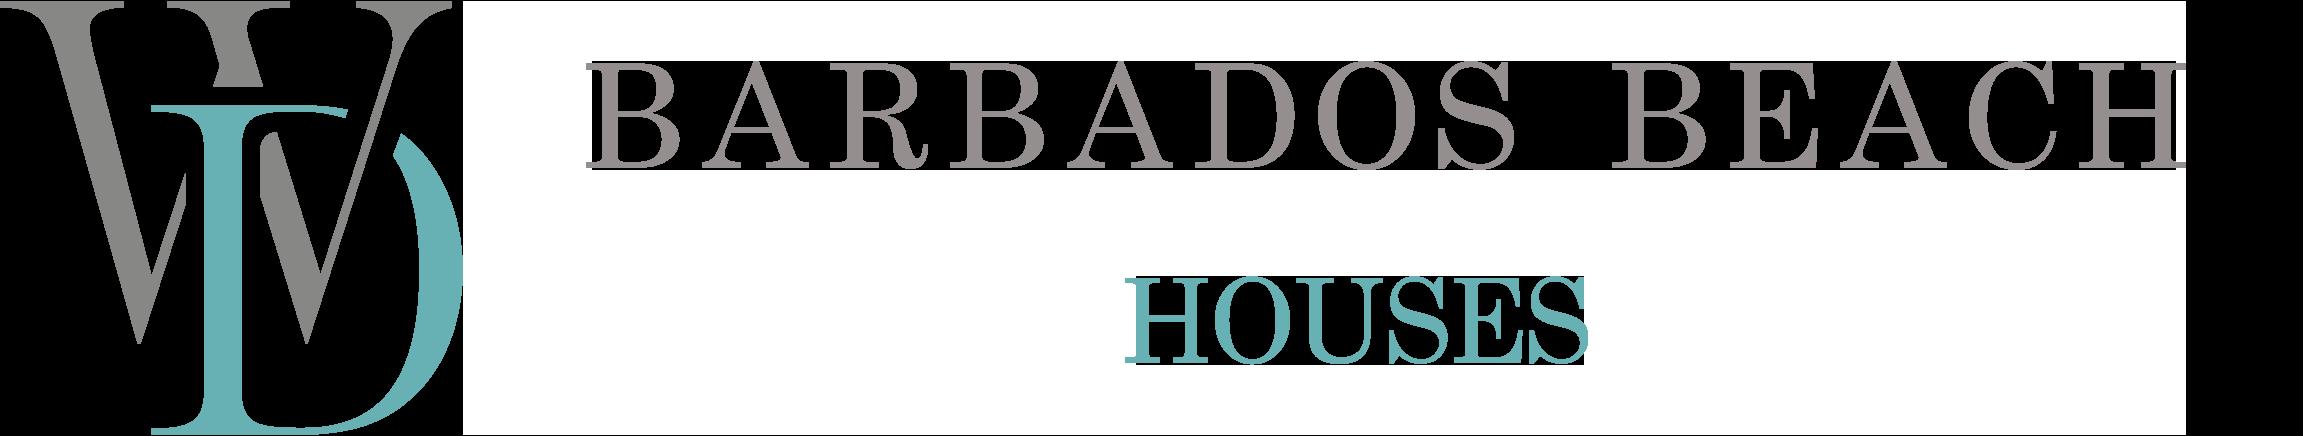 Barbados Beach House